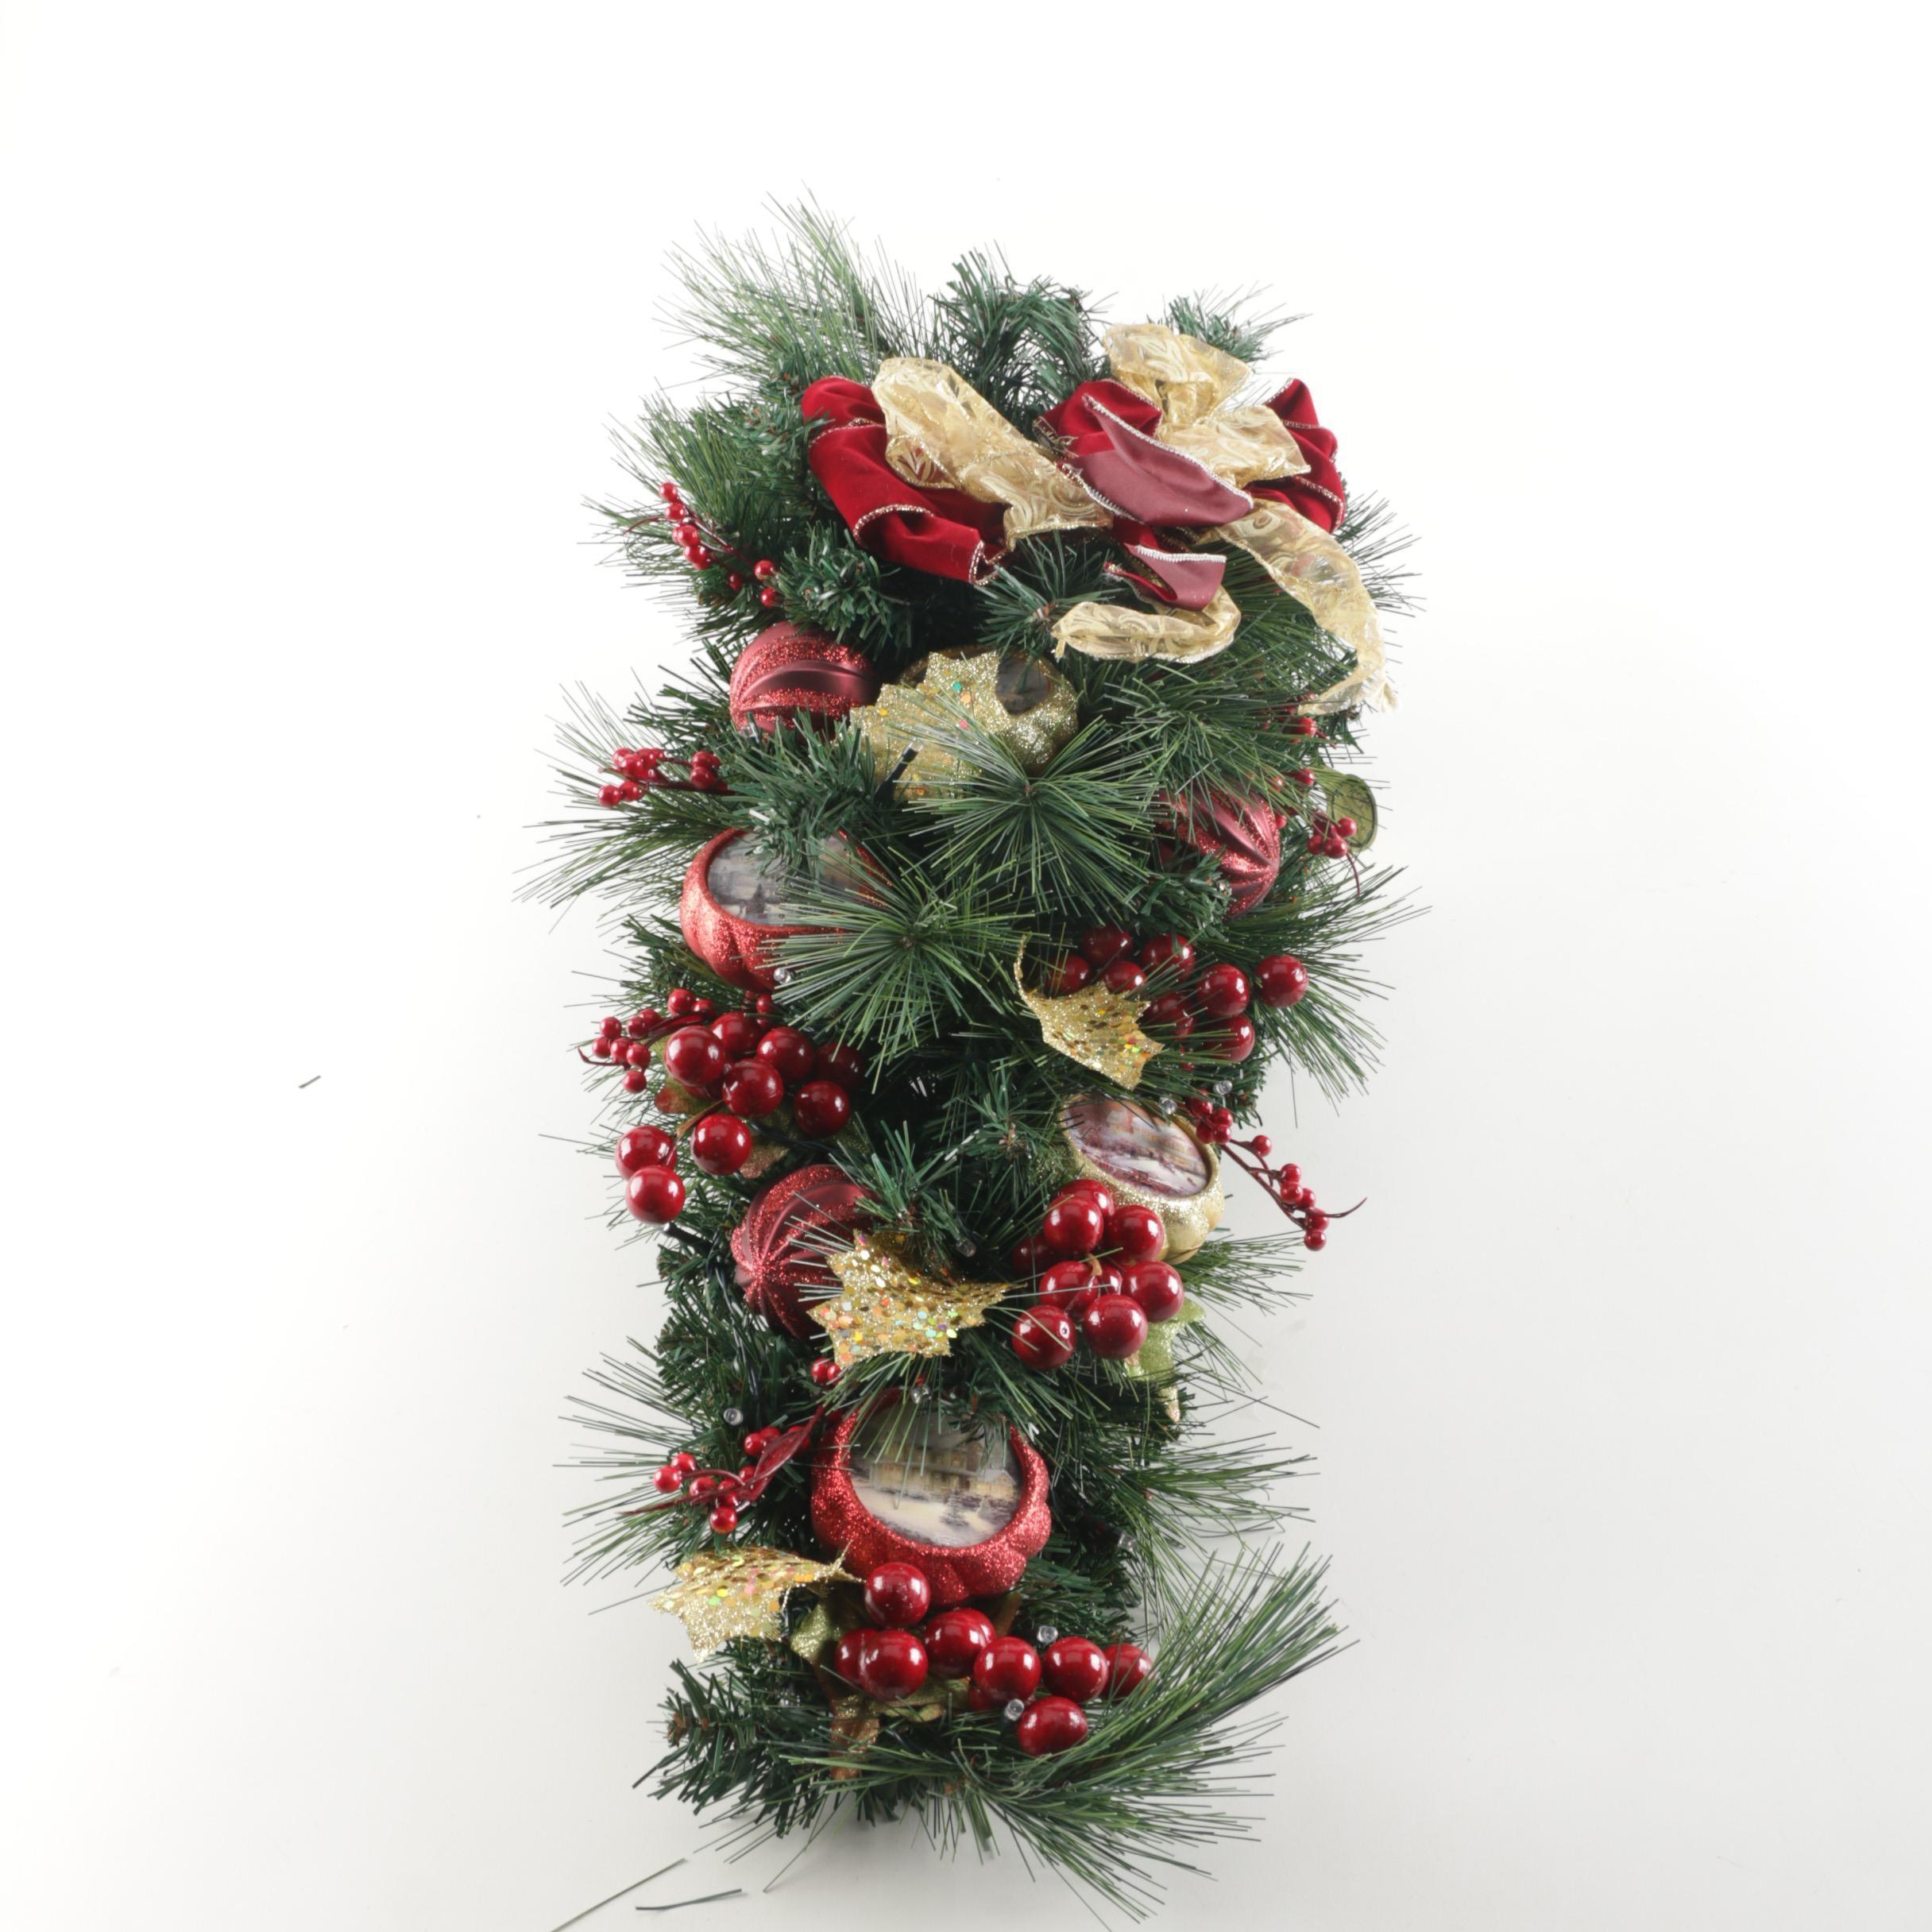 Thomas Kinkade Illuminated Christmas Garland